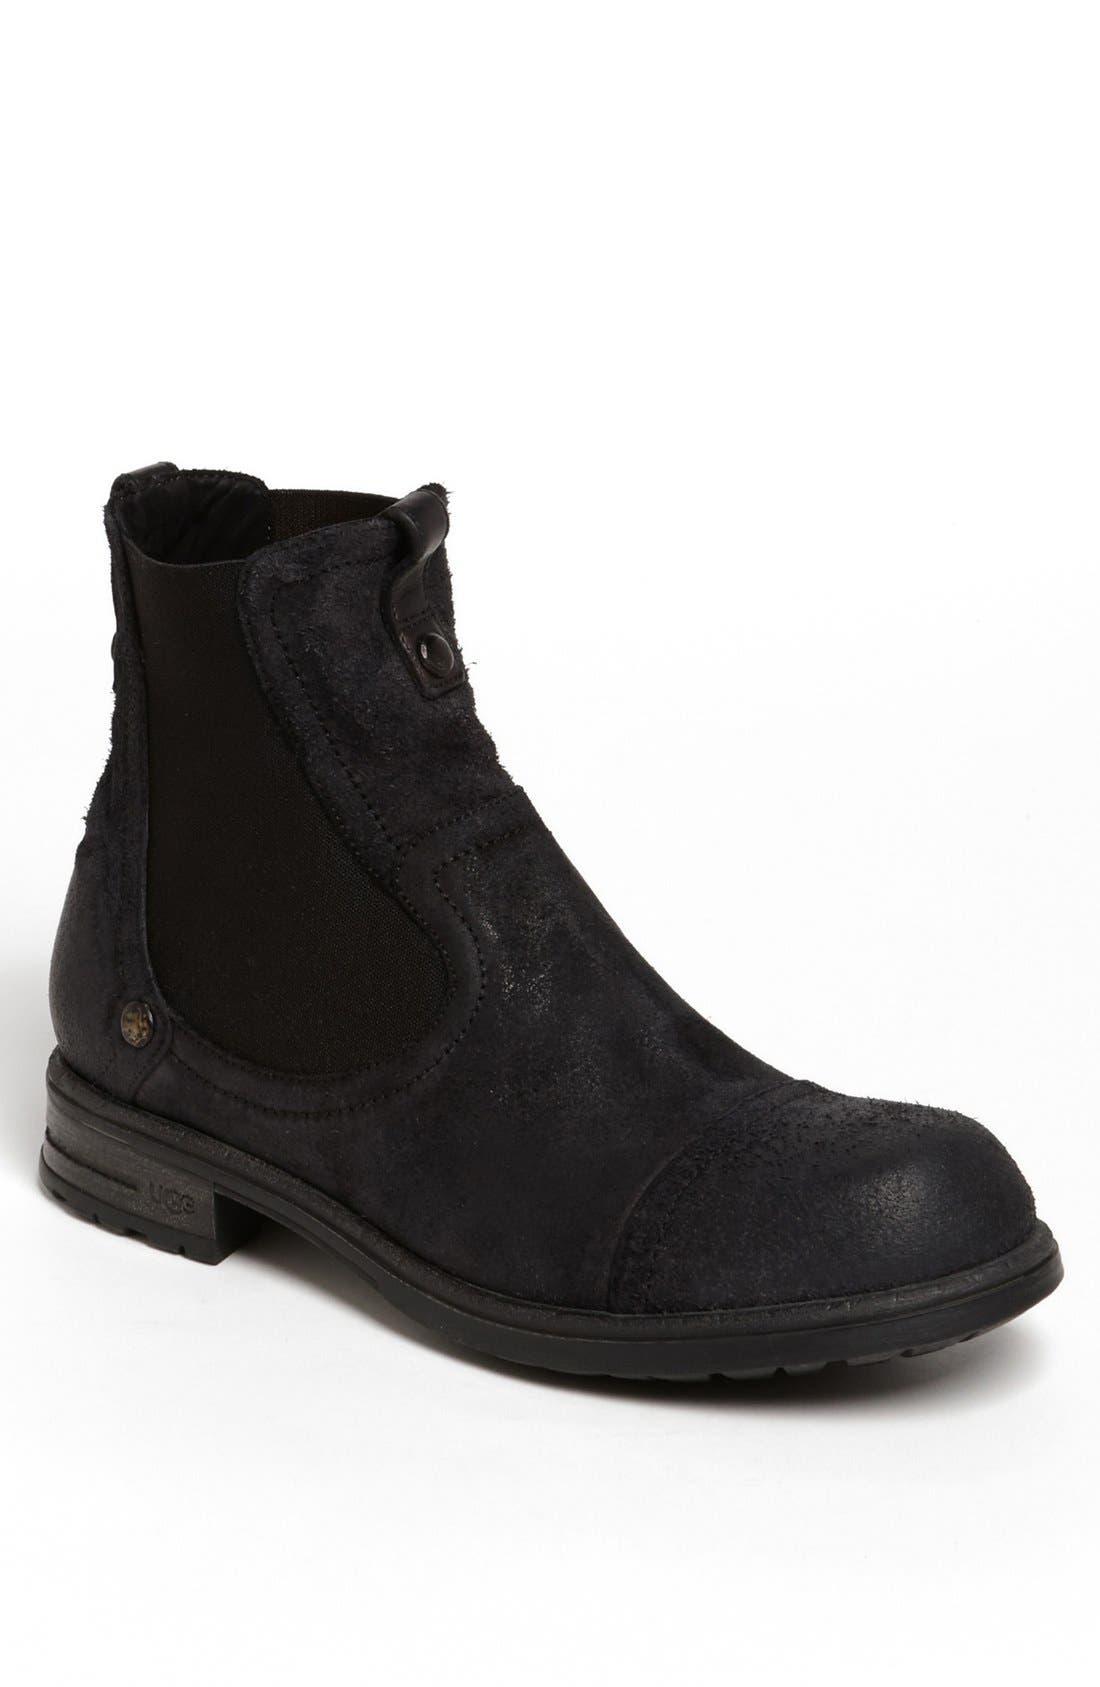 'Amone' Boot,                             Main thumbnail 1, color,                             001